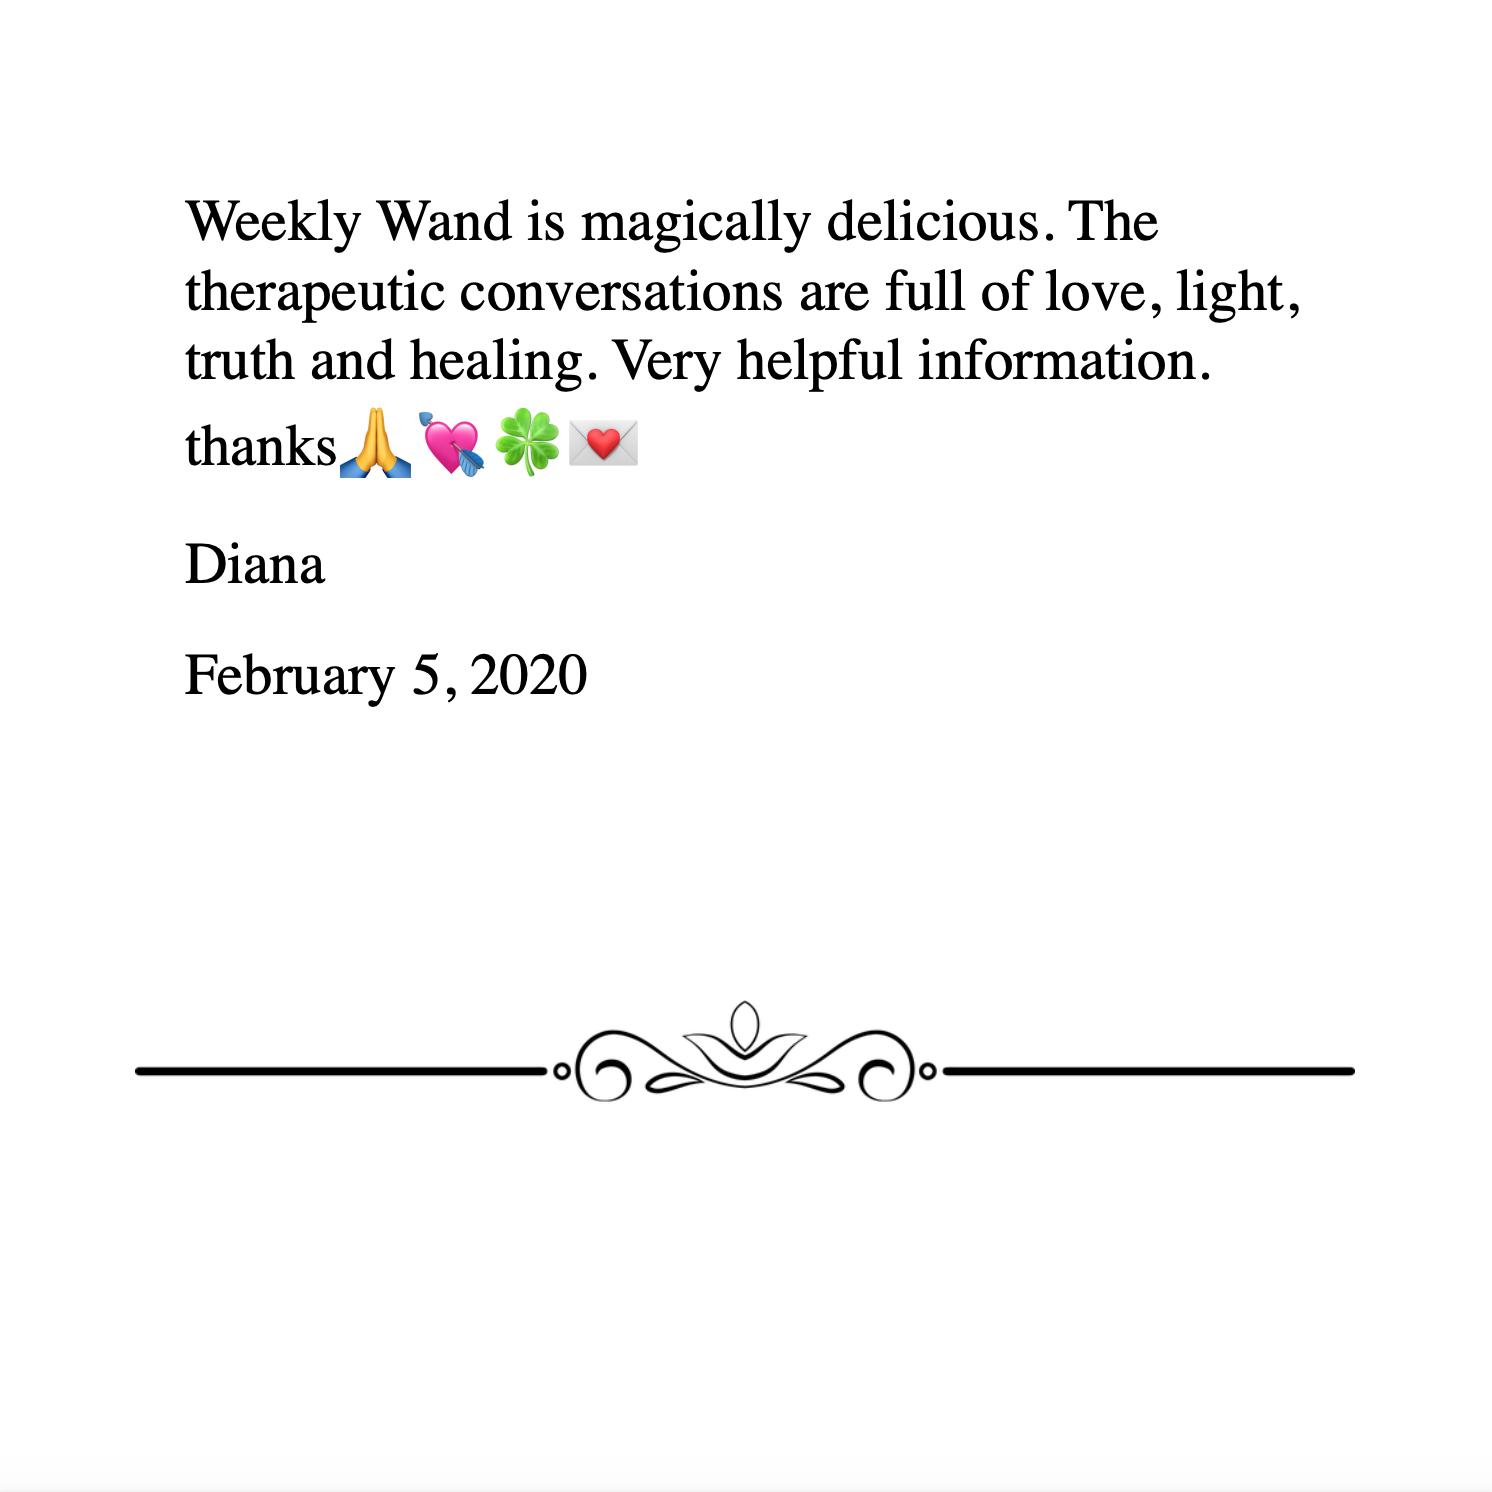 Diana 2.5.2020